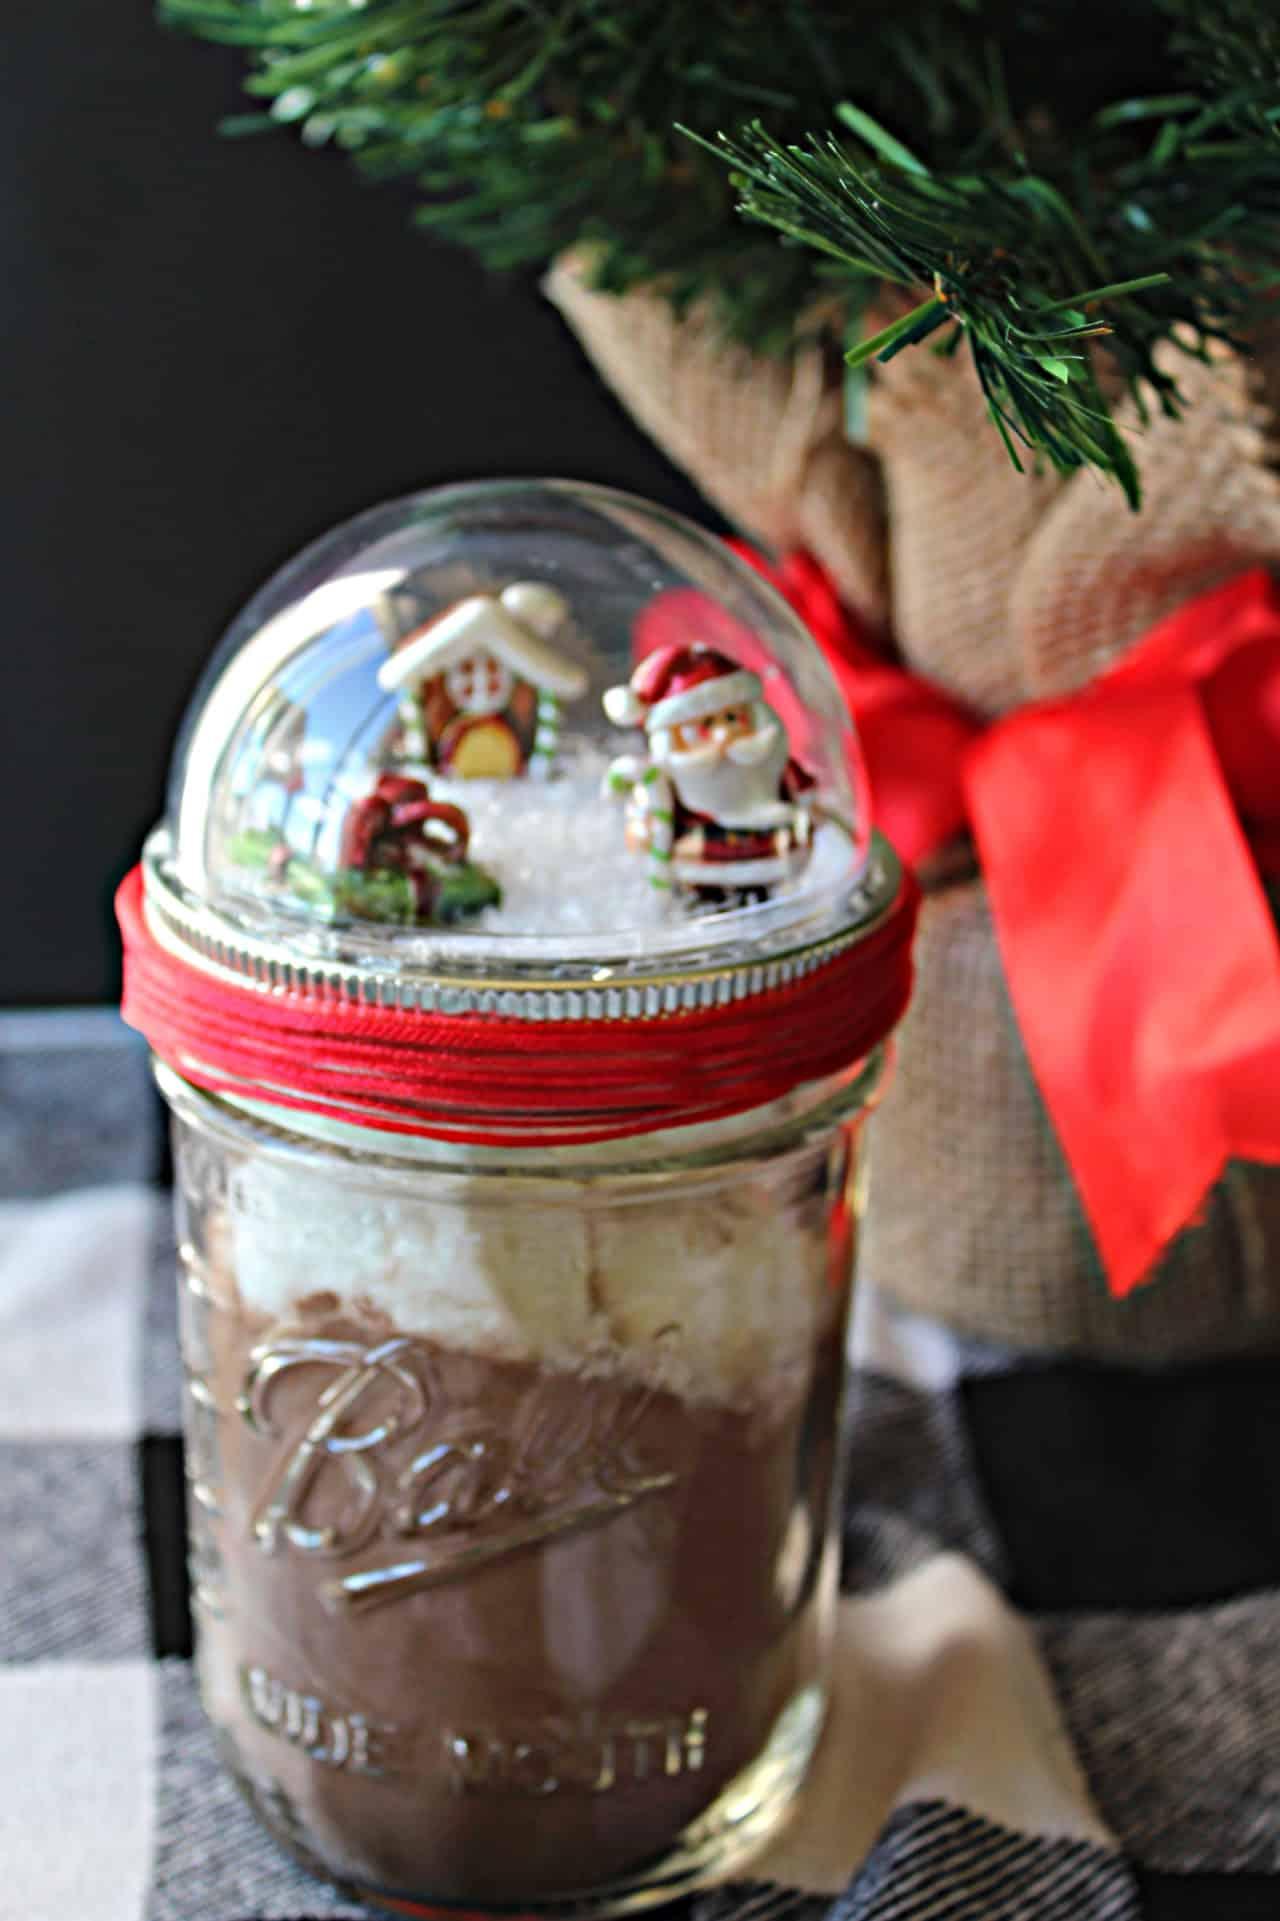 Fun Gift Idea: How to Make Your Own Snow Globe Mason Jars!